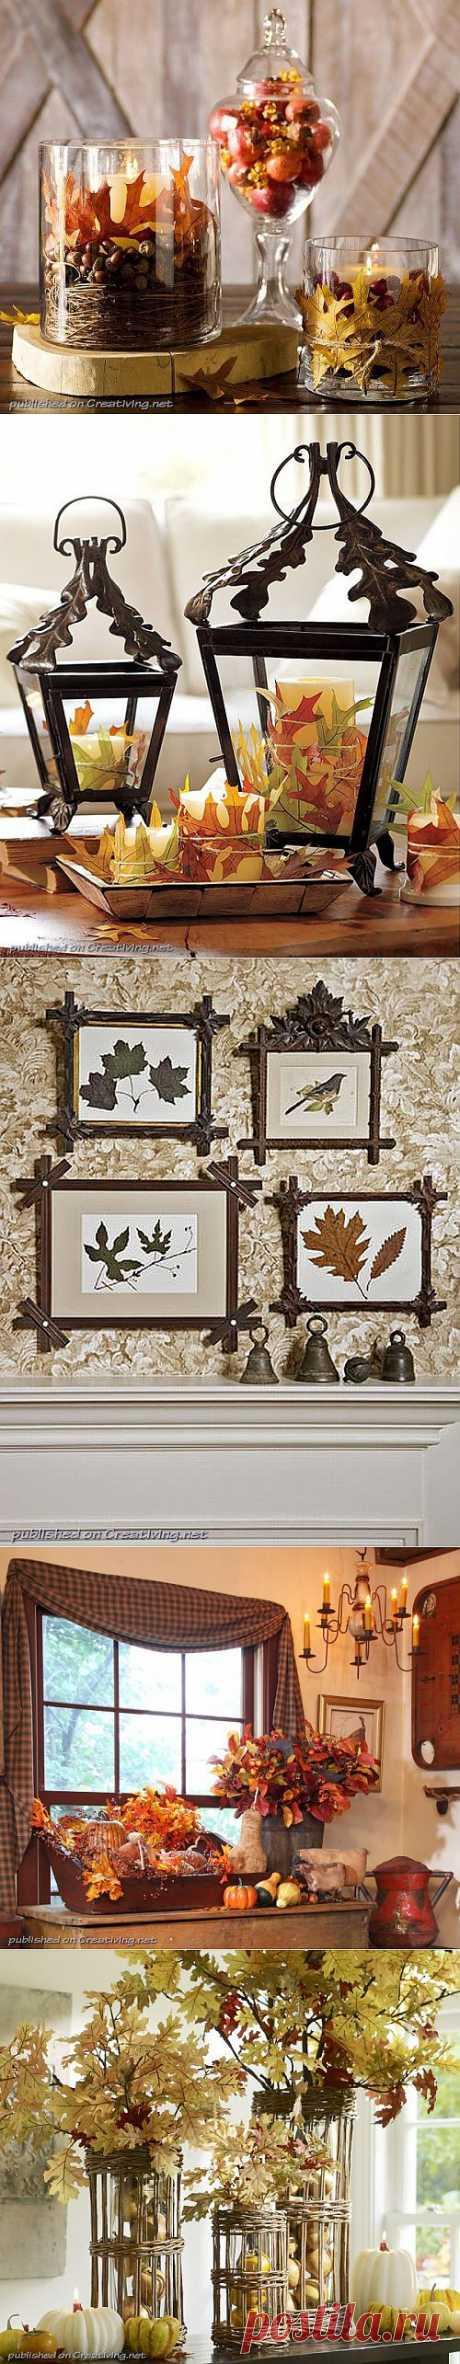 Осенний декор для дома своими руками (30 фото) | Креативные фотографии